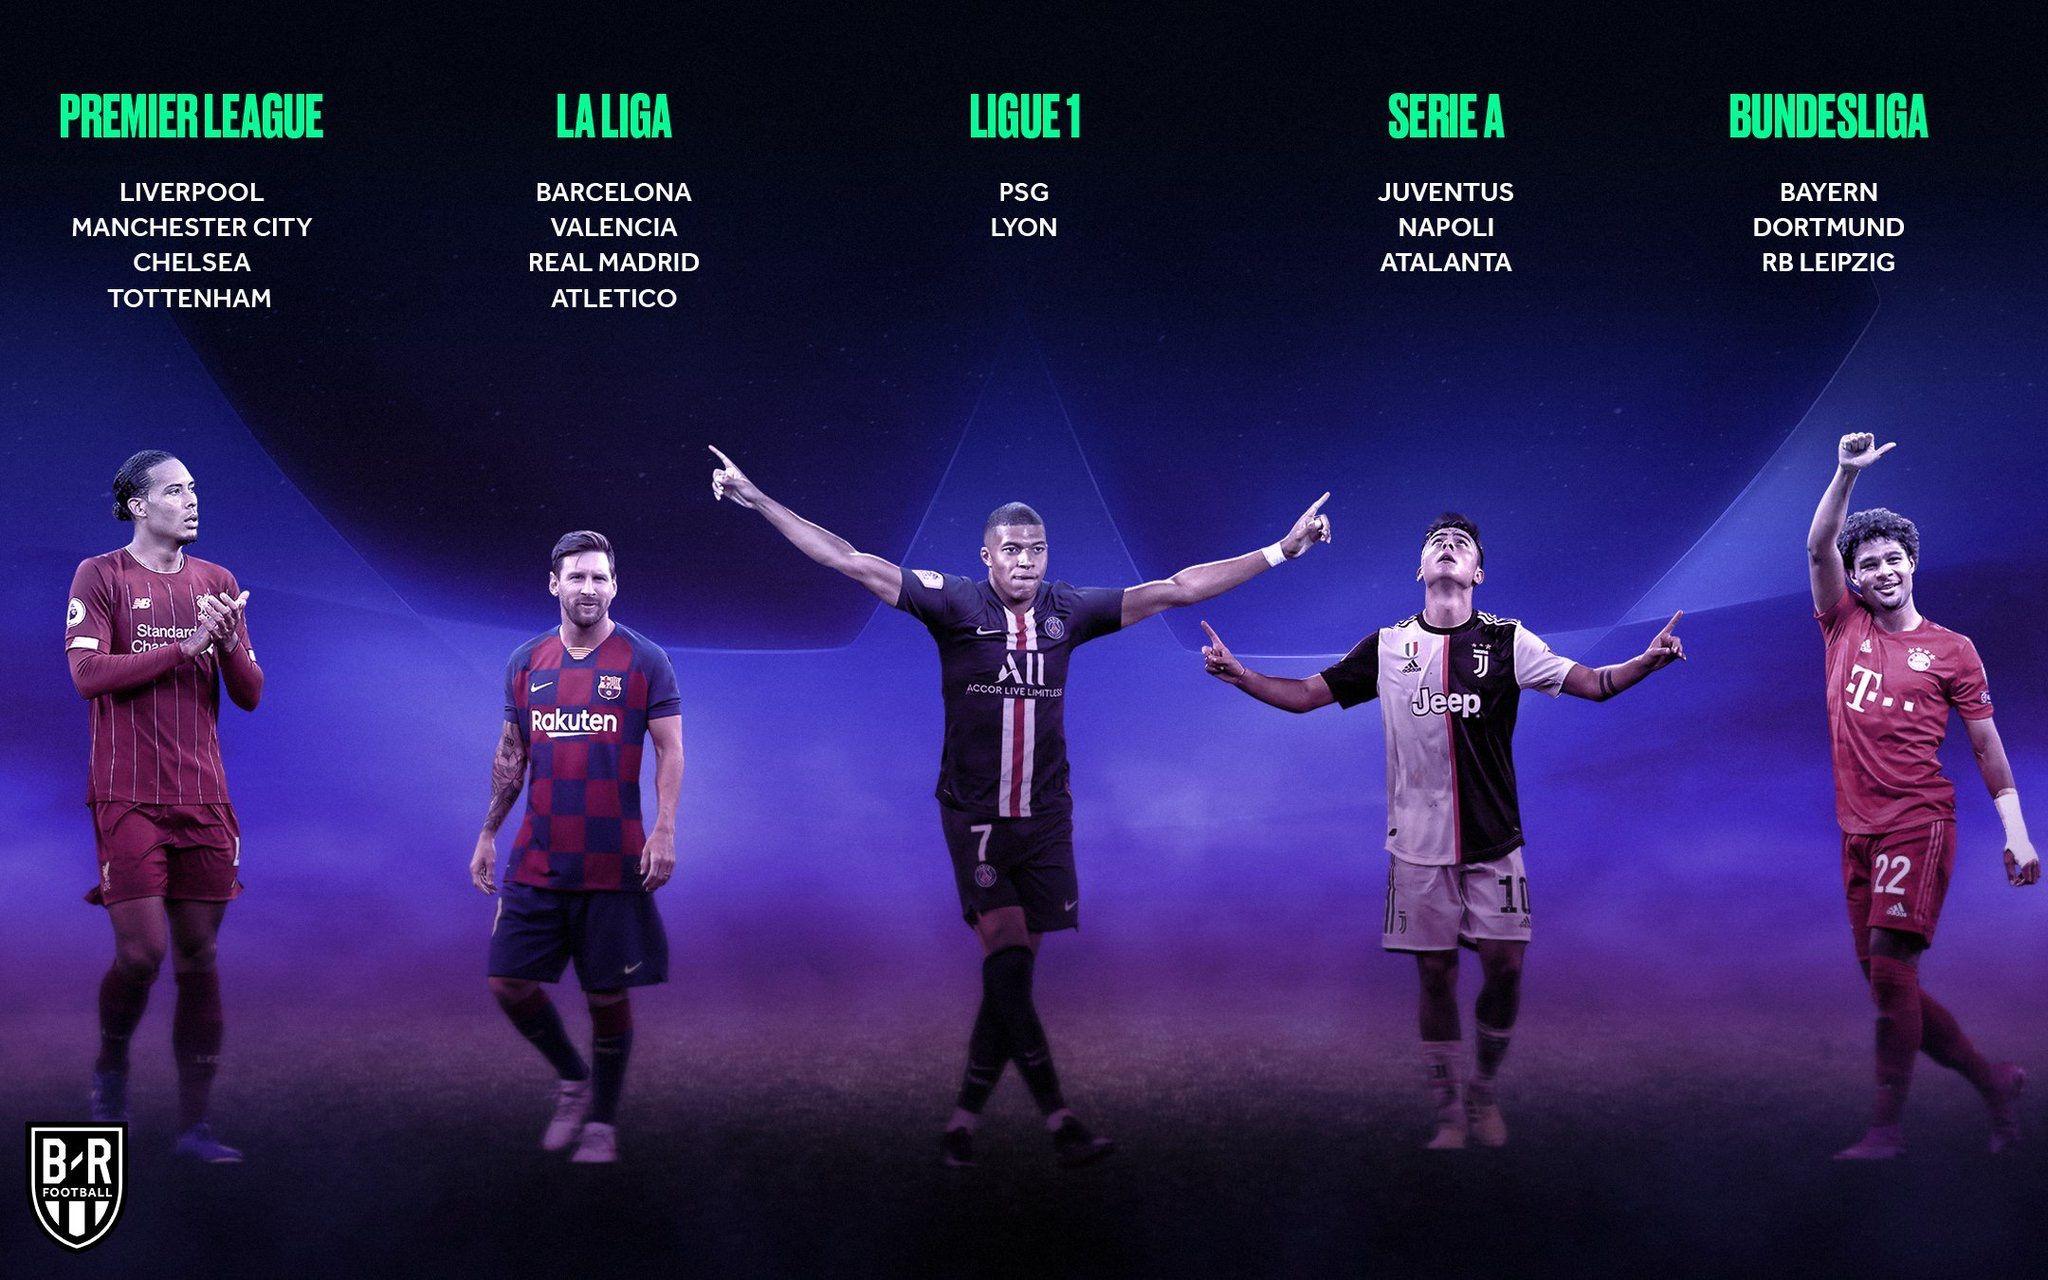 championsleague 20192020